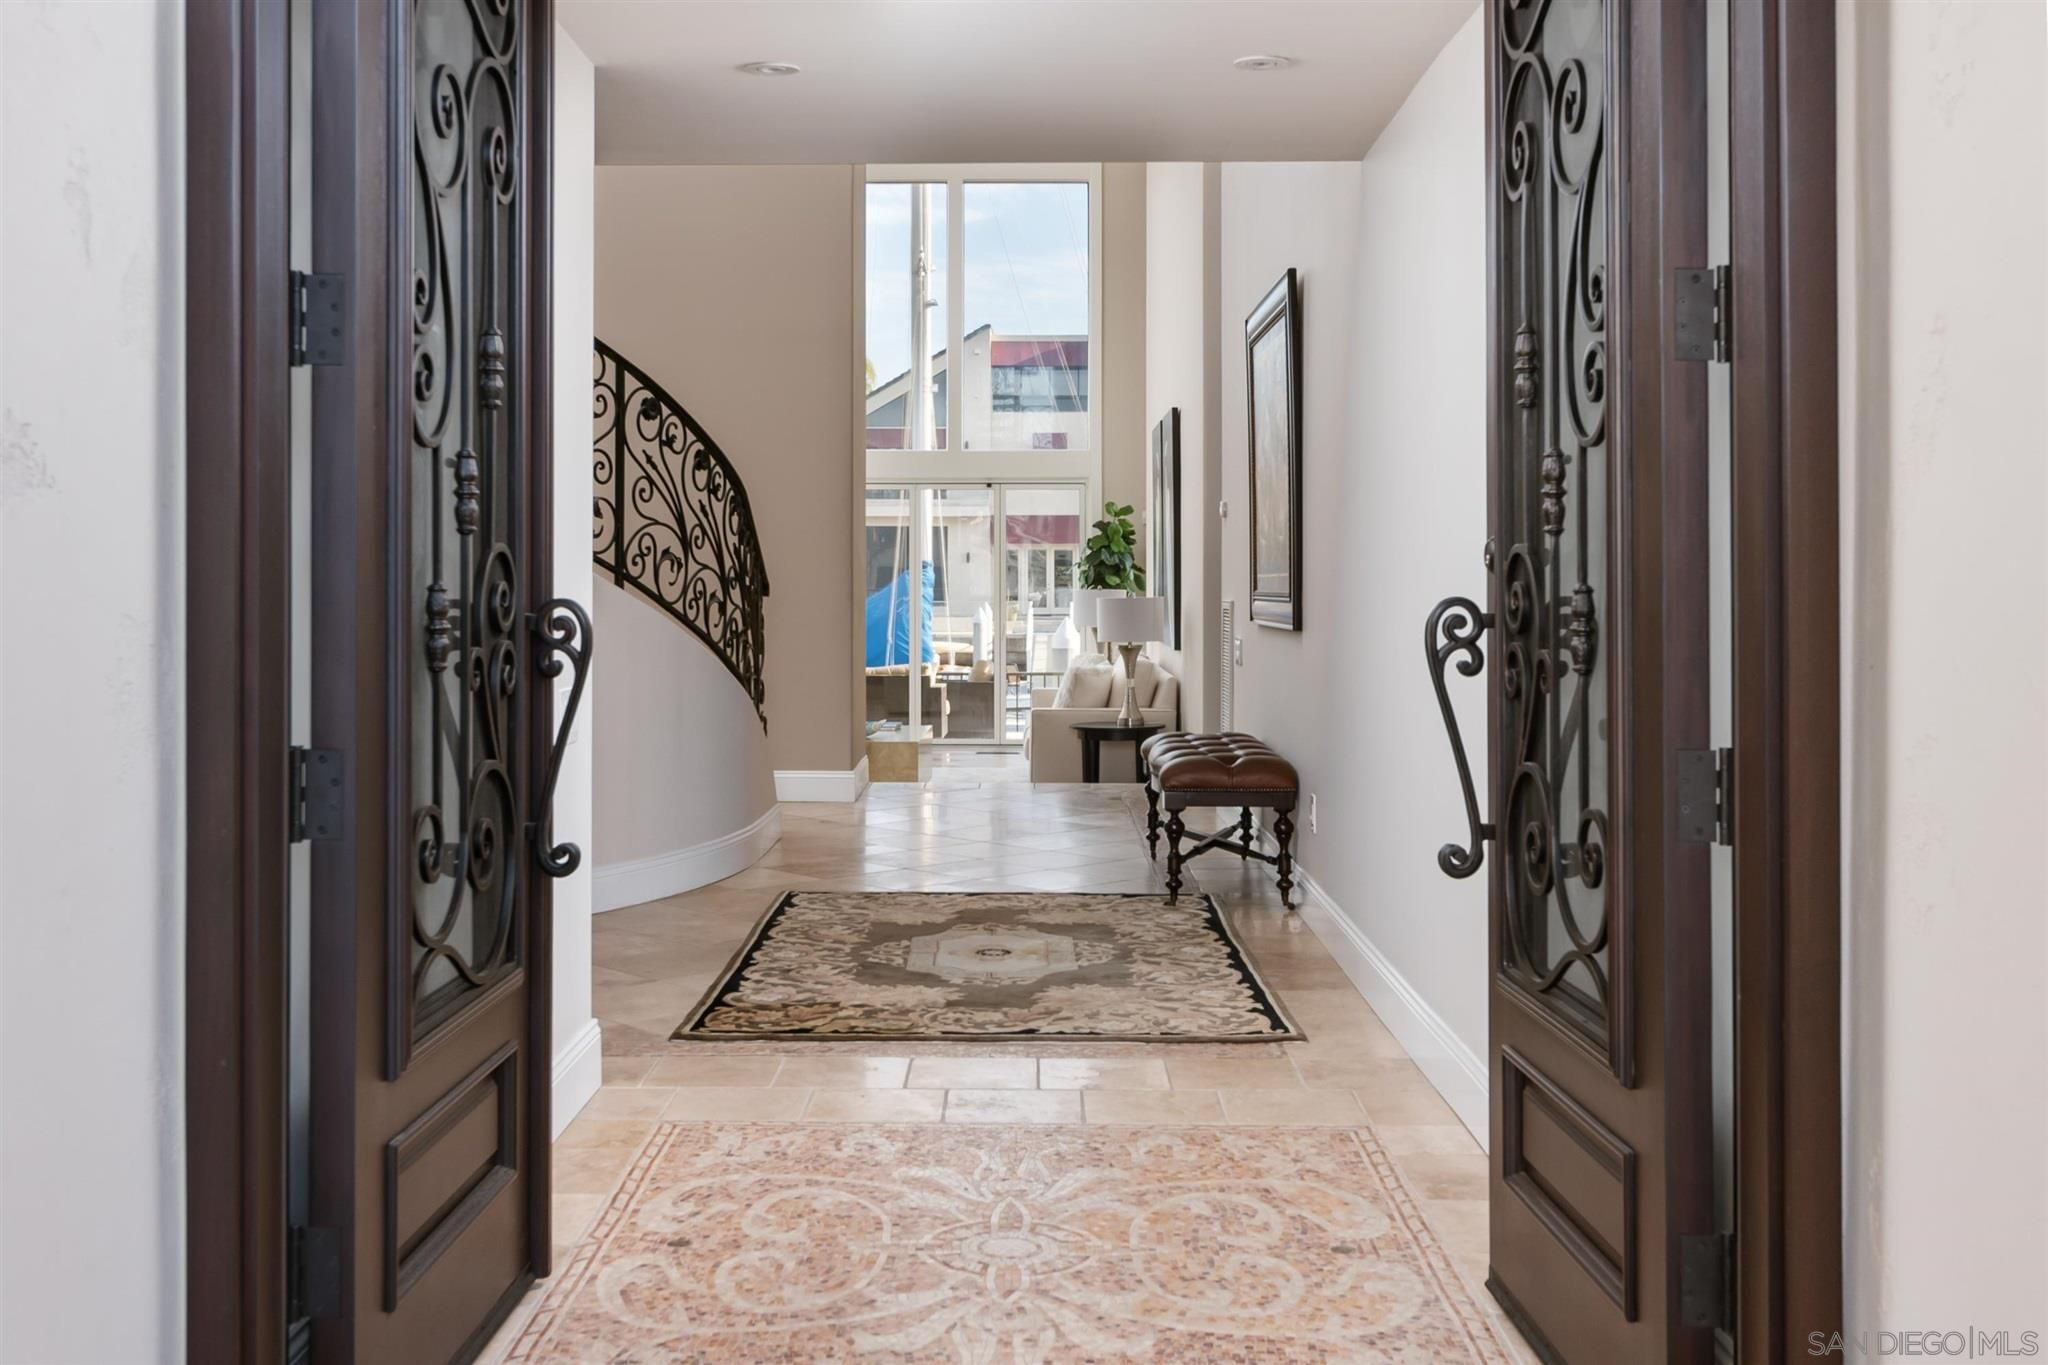 Main Photo: CORONADO CAYS House for sale : 4 bedrooms : 26 Blue Anchor Cay Road in Coronado